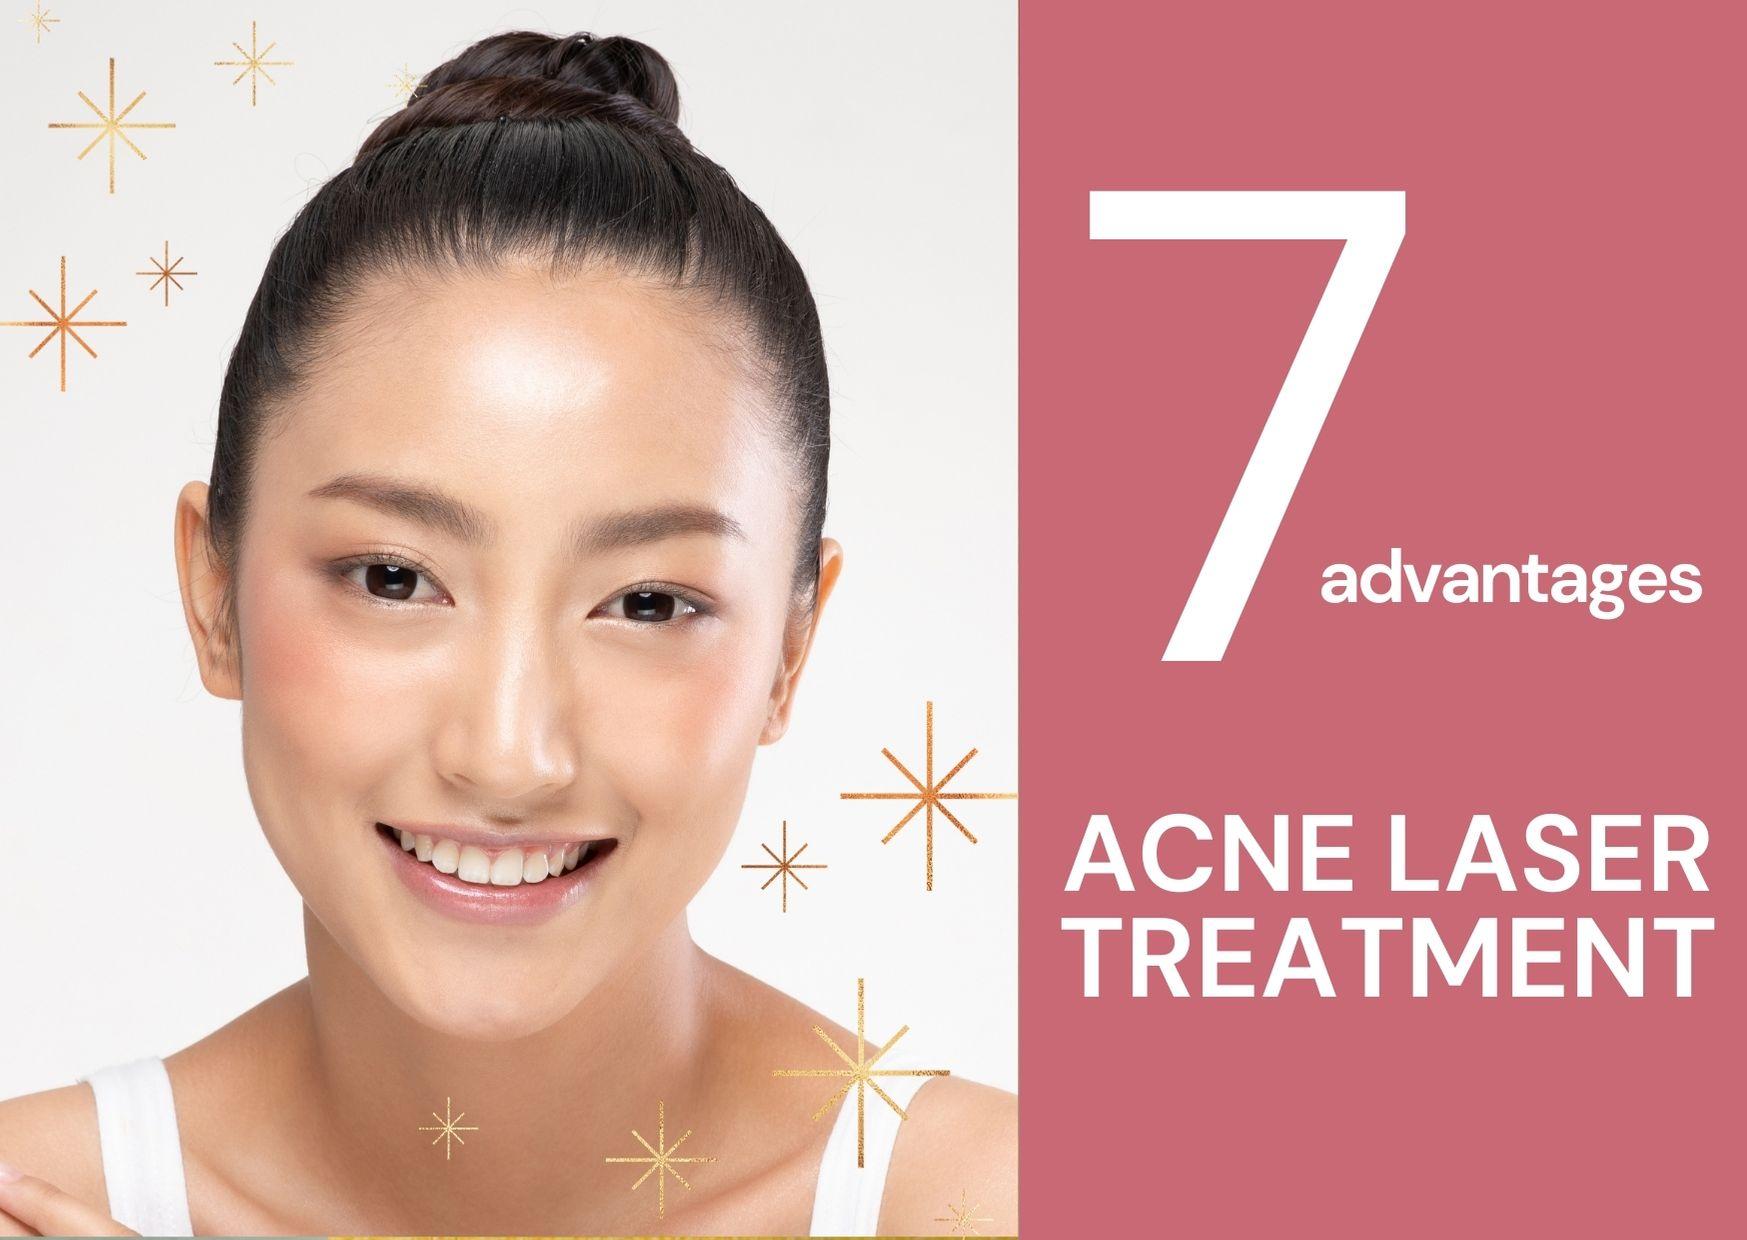 7 advantages of doing acne laser treatment